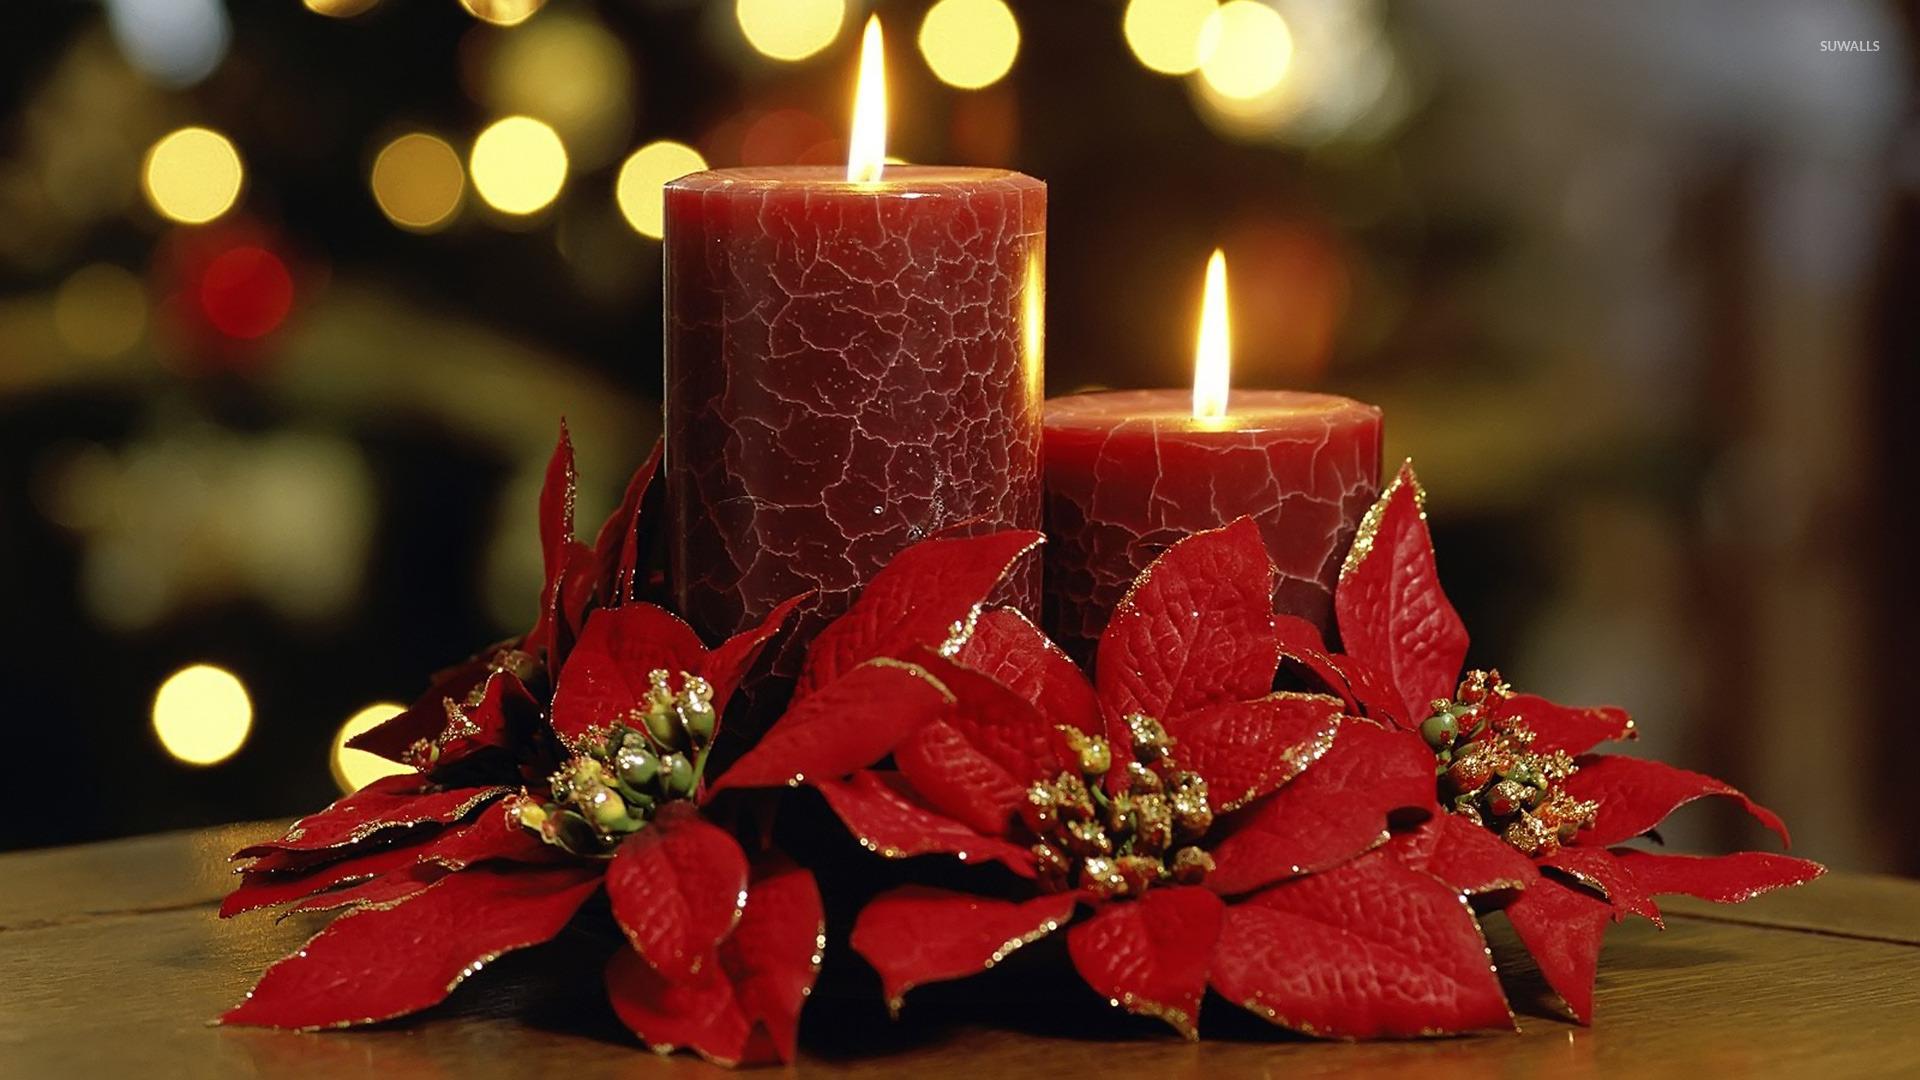 Christmas Candles Wallpaper Holiday Wallpapers 9802